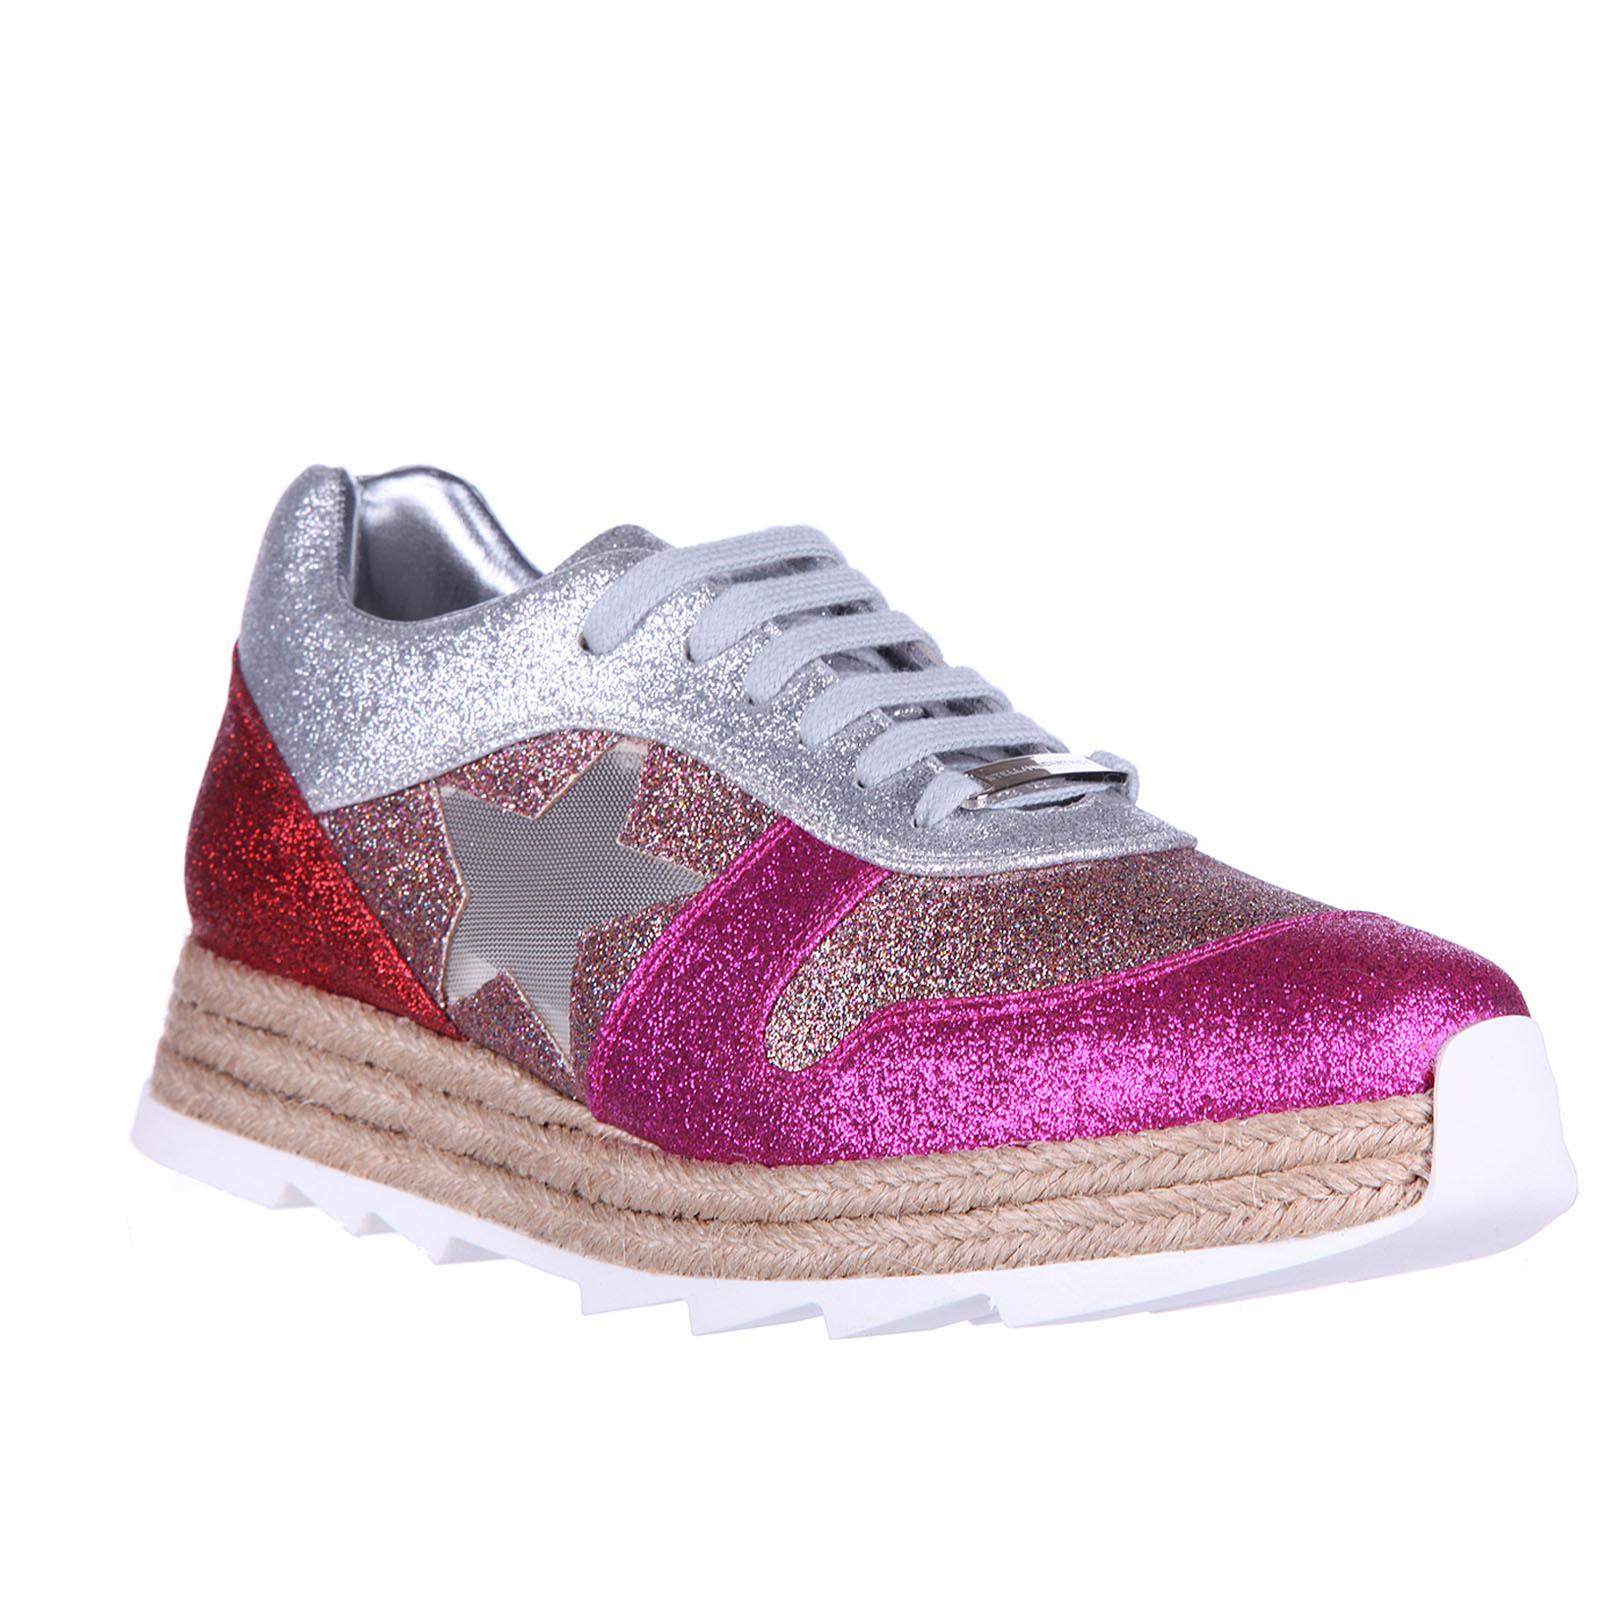 Damenschuhe damen schuhe sneakers turnschuhe orignale isley